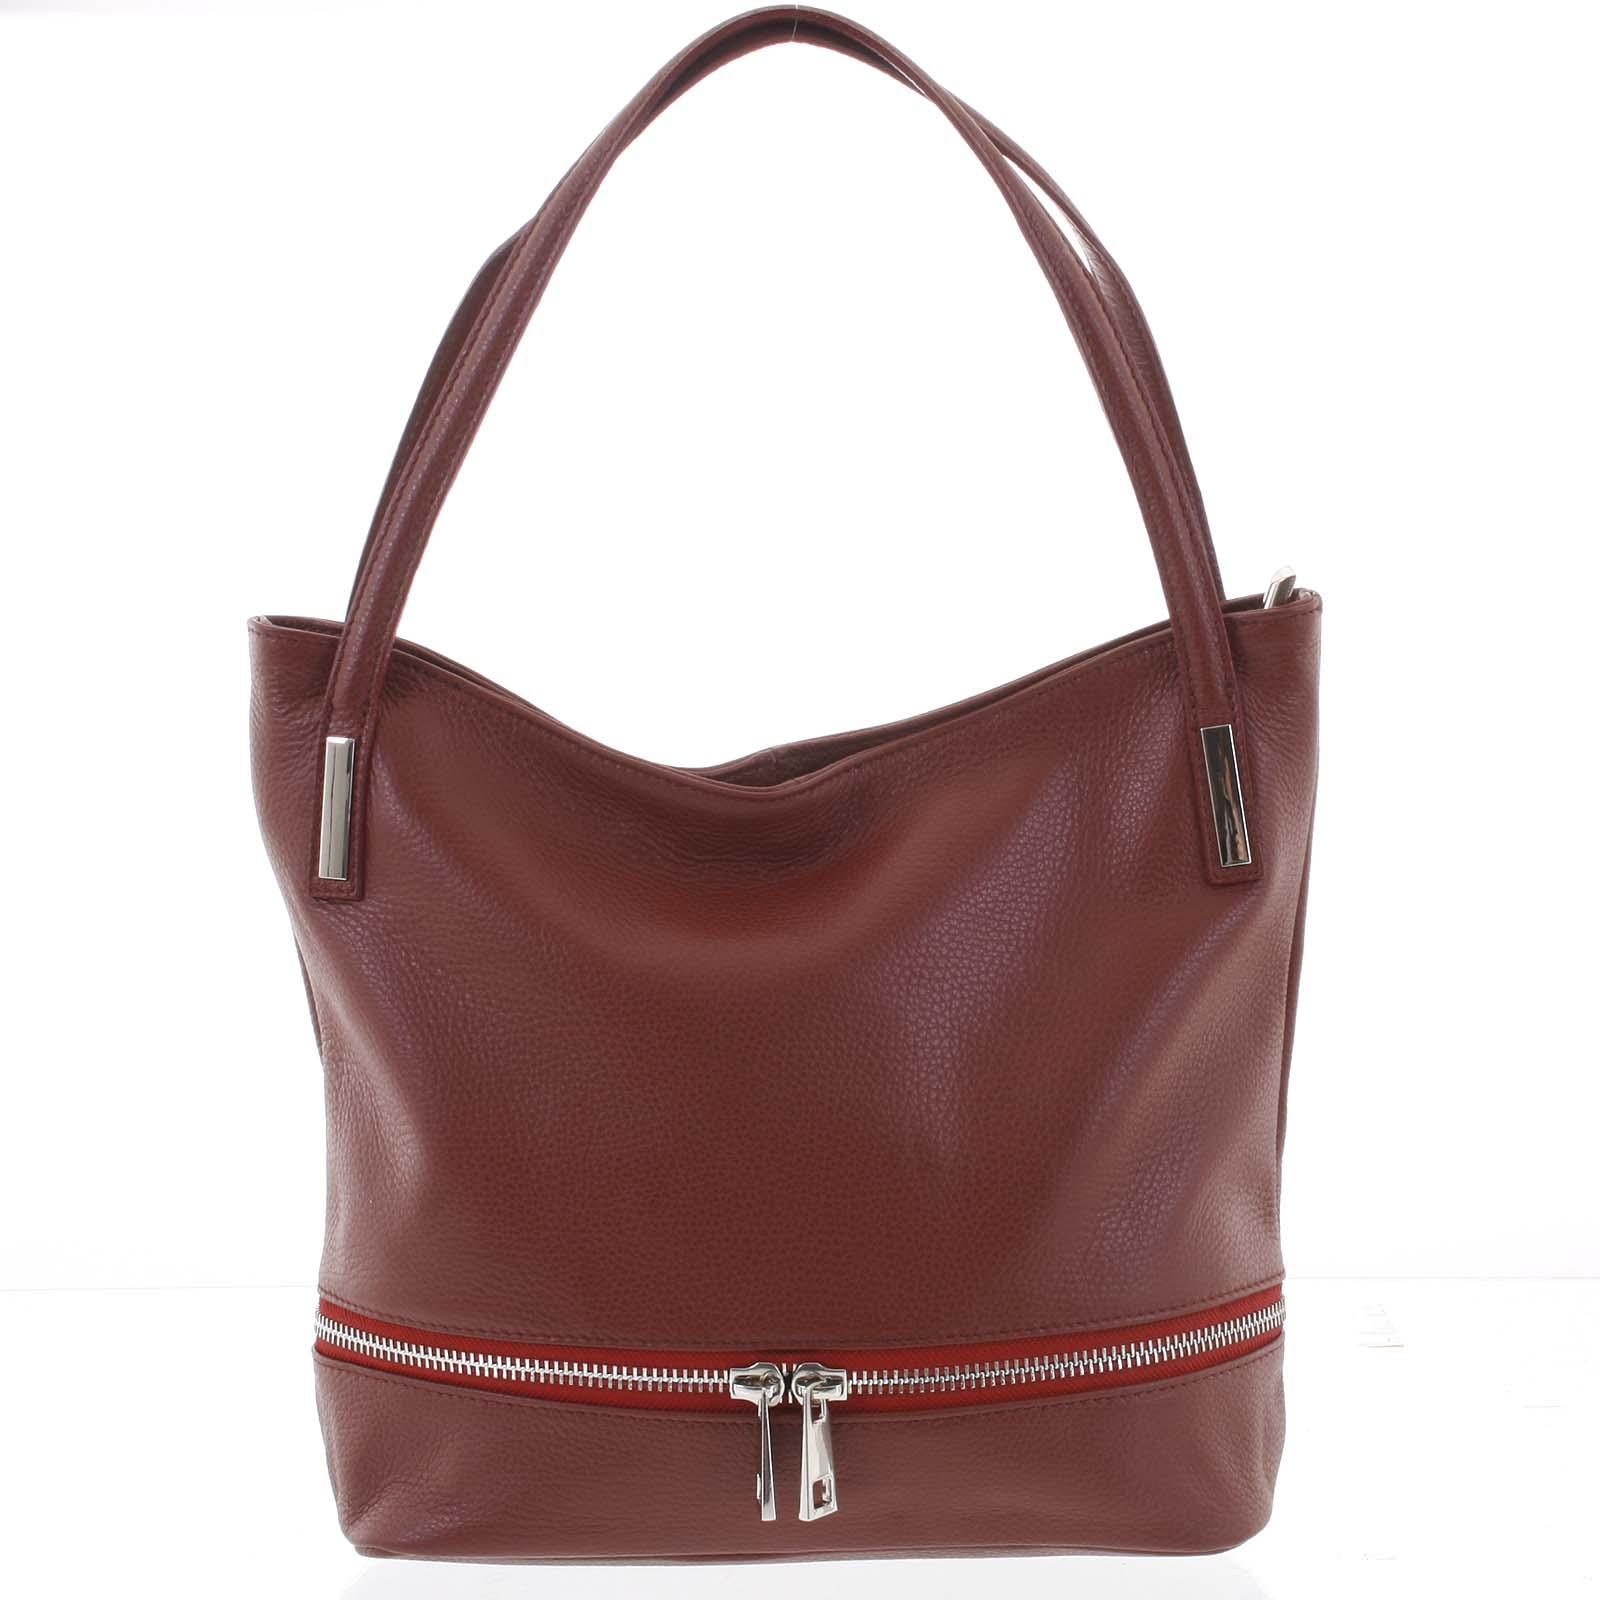 Dámska štýlová kožená kabelka cez rameno vínová - ItalY Acness vínová